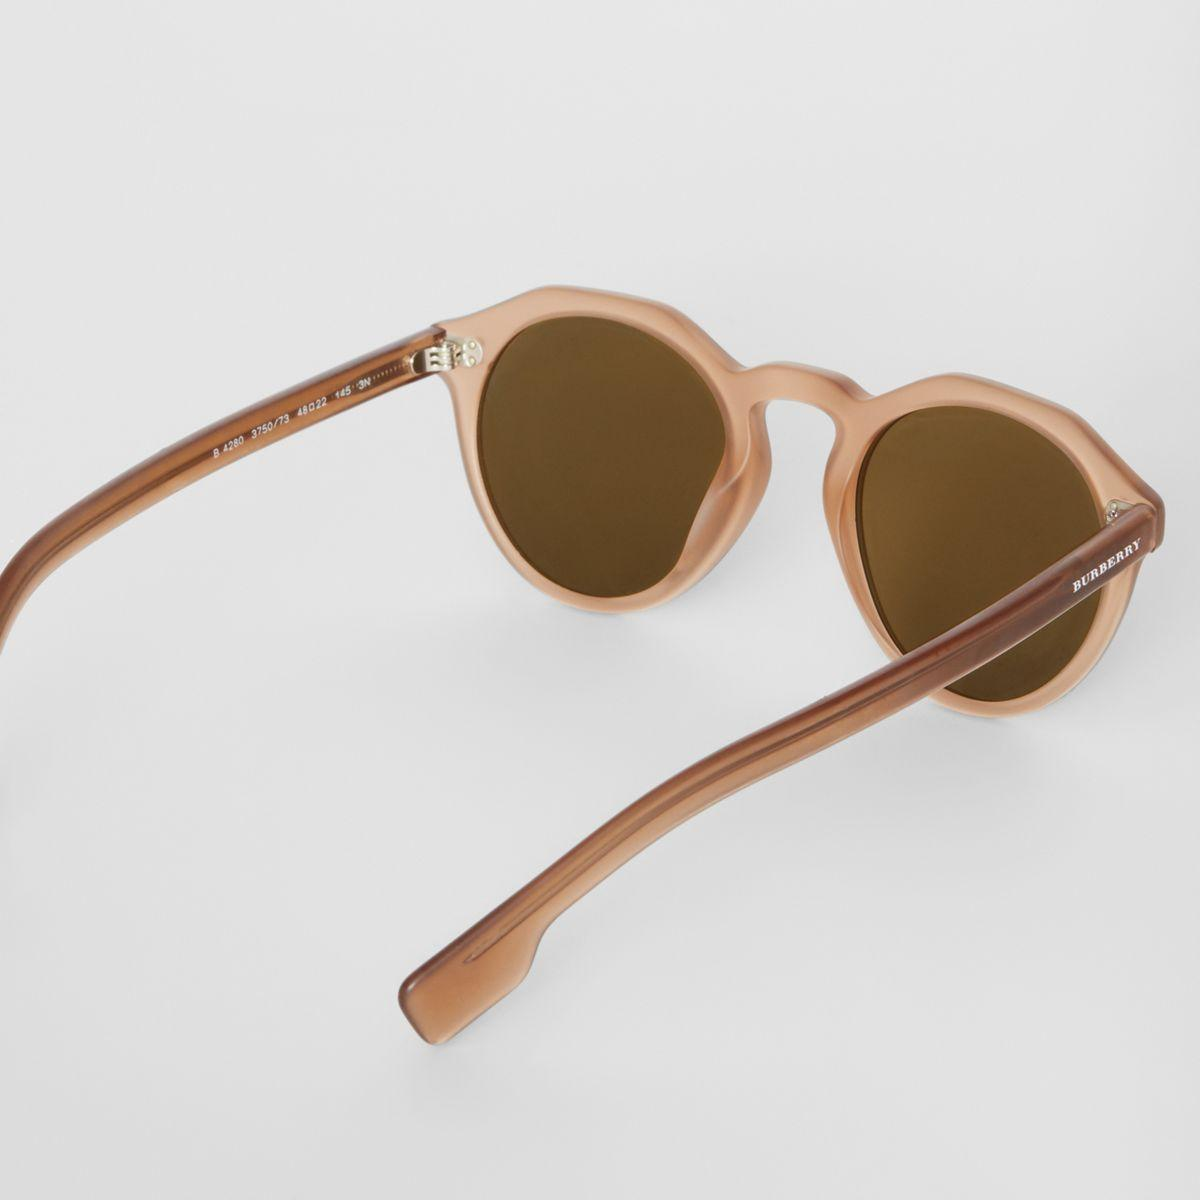 22e564e05fee Burberry - Brown Keyhole Round Frame Sunglasses for Men - Lyst. View  fullscreen